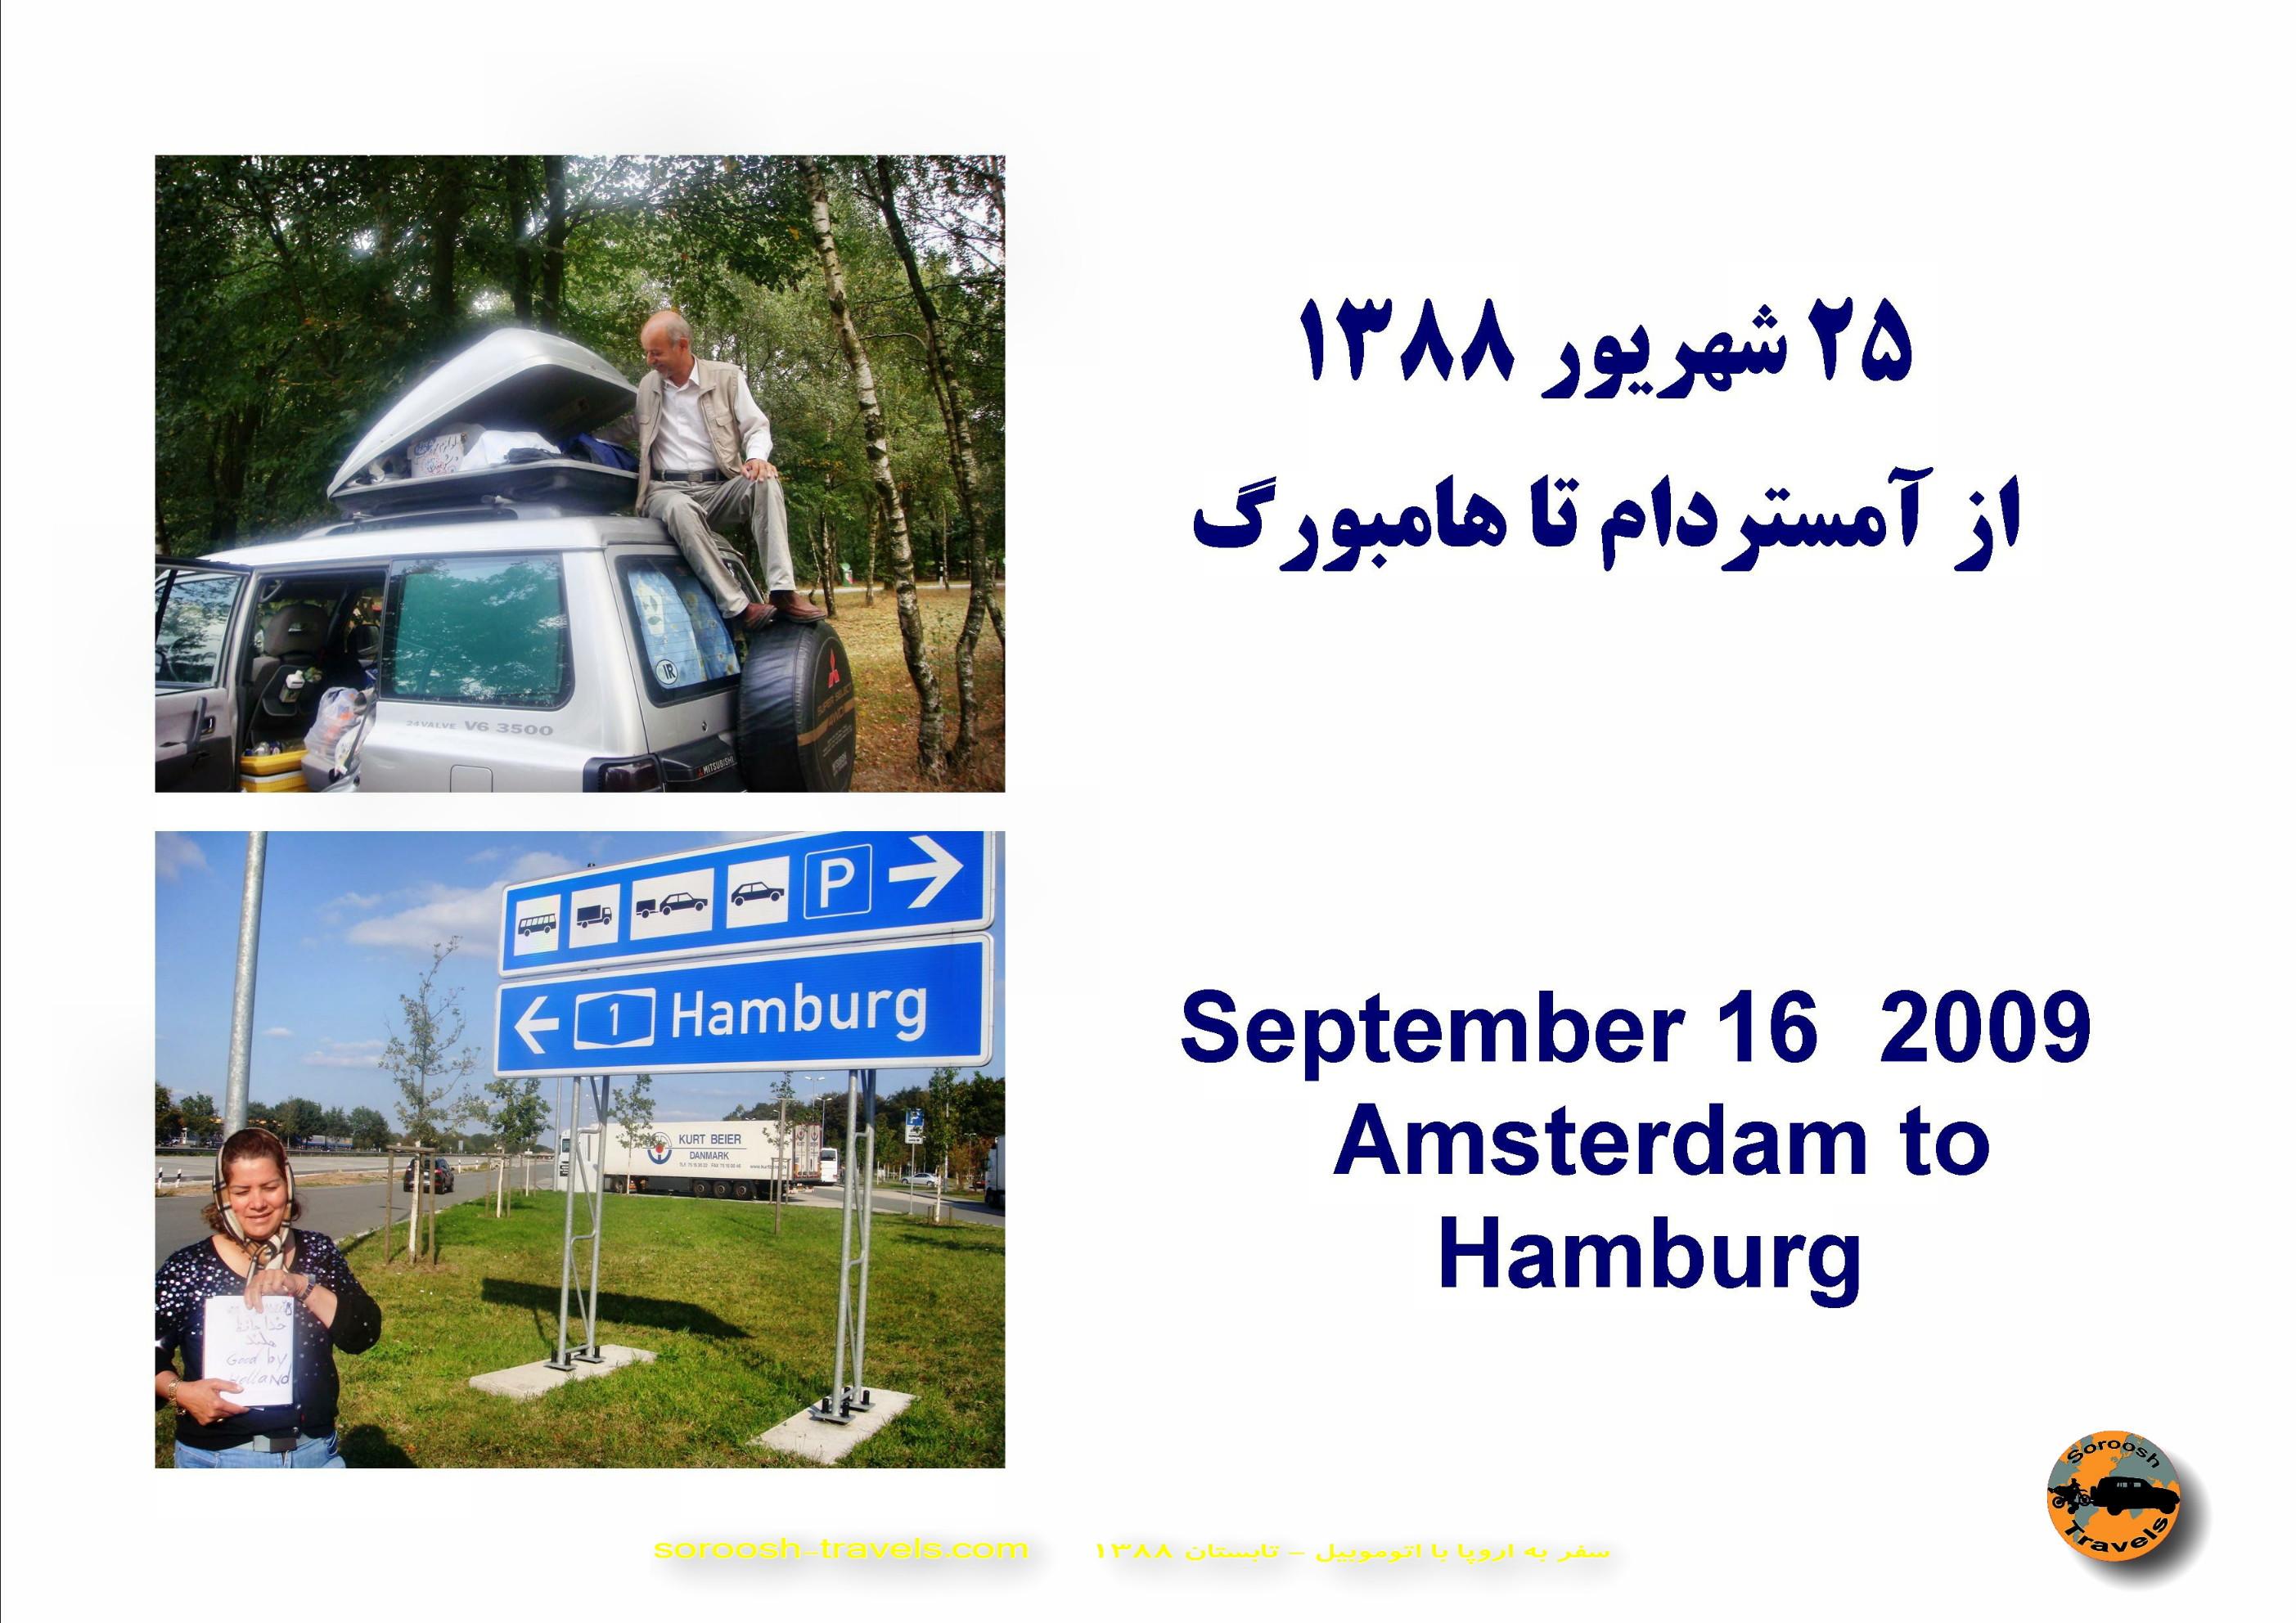 25-shahrivar-1388-16-september-2009-amsterdam-in-netherland-to-hamburg-in-germany-1